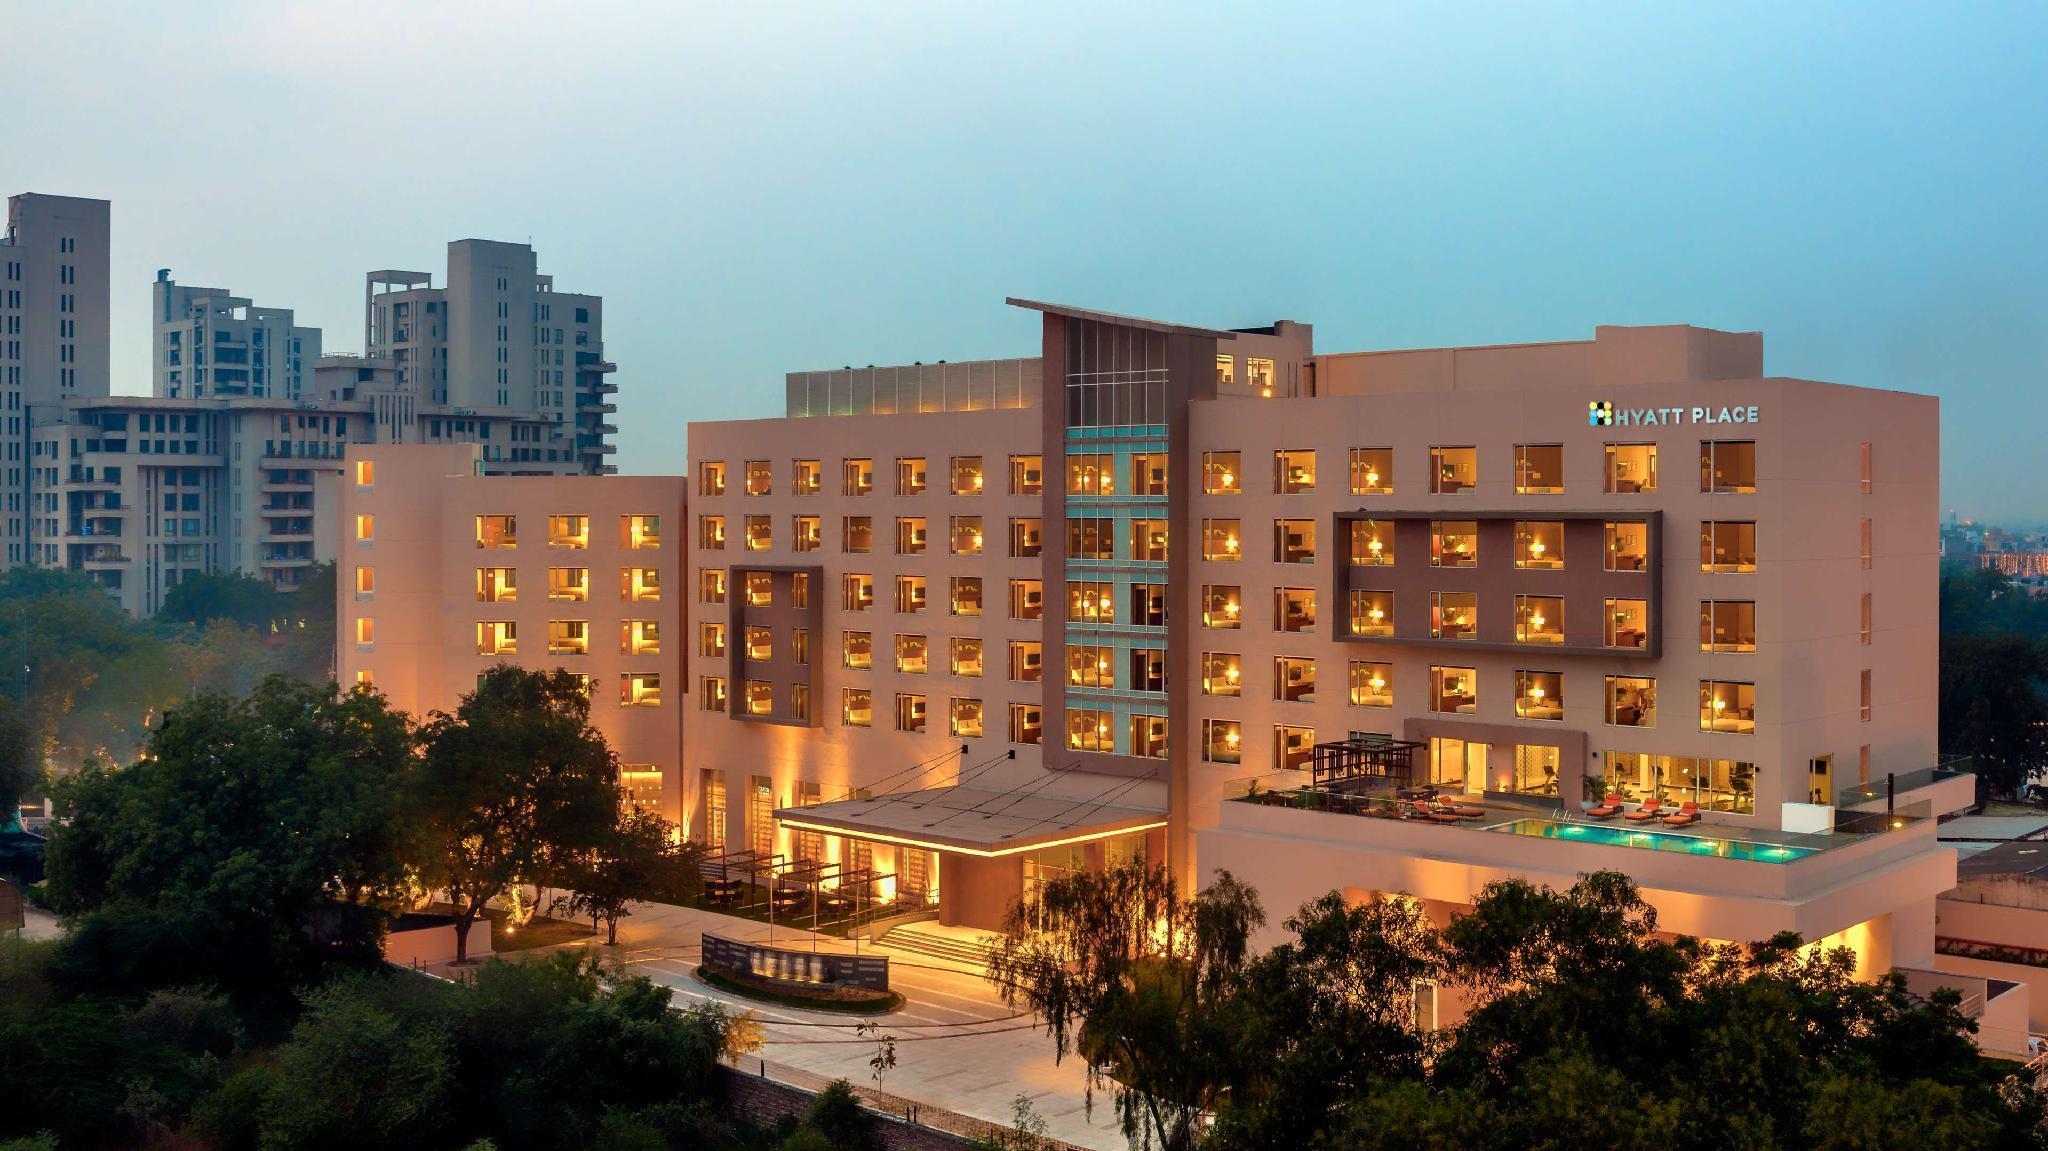 Hyatt Place Gurgaon Udyog Vihar New Delhi And Ncr Hotels